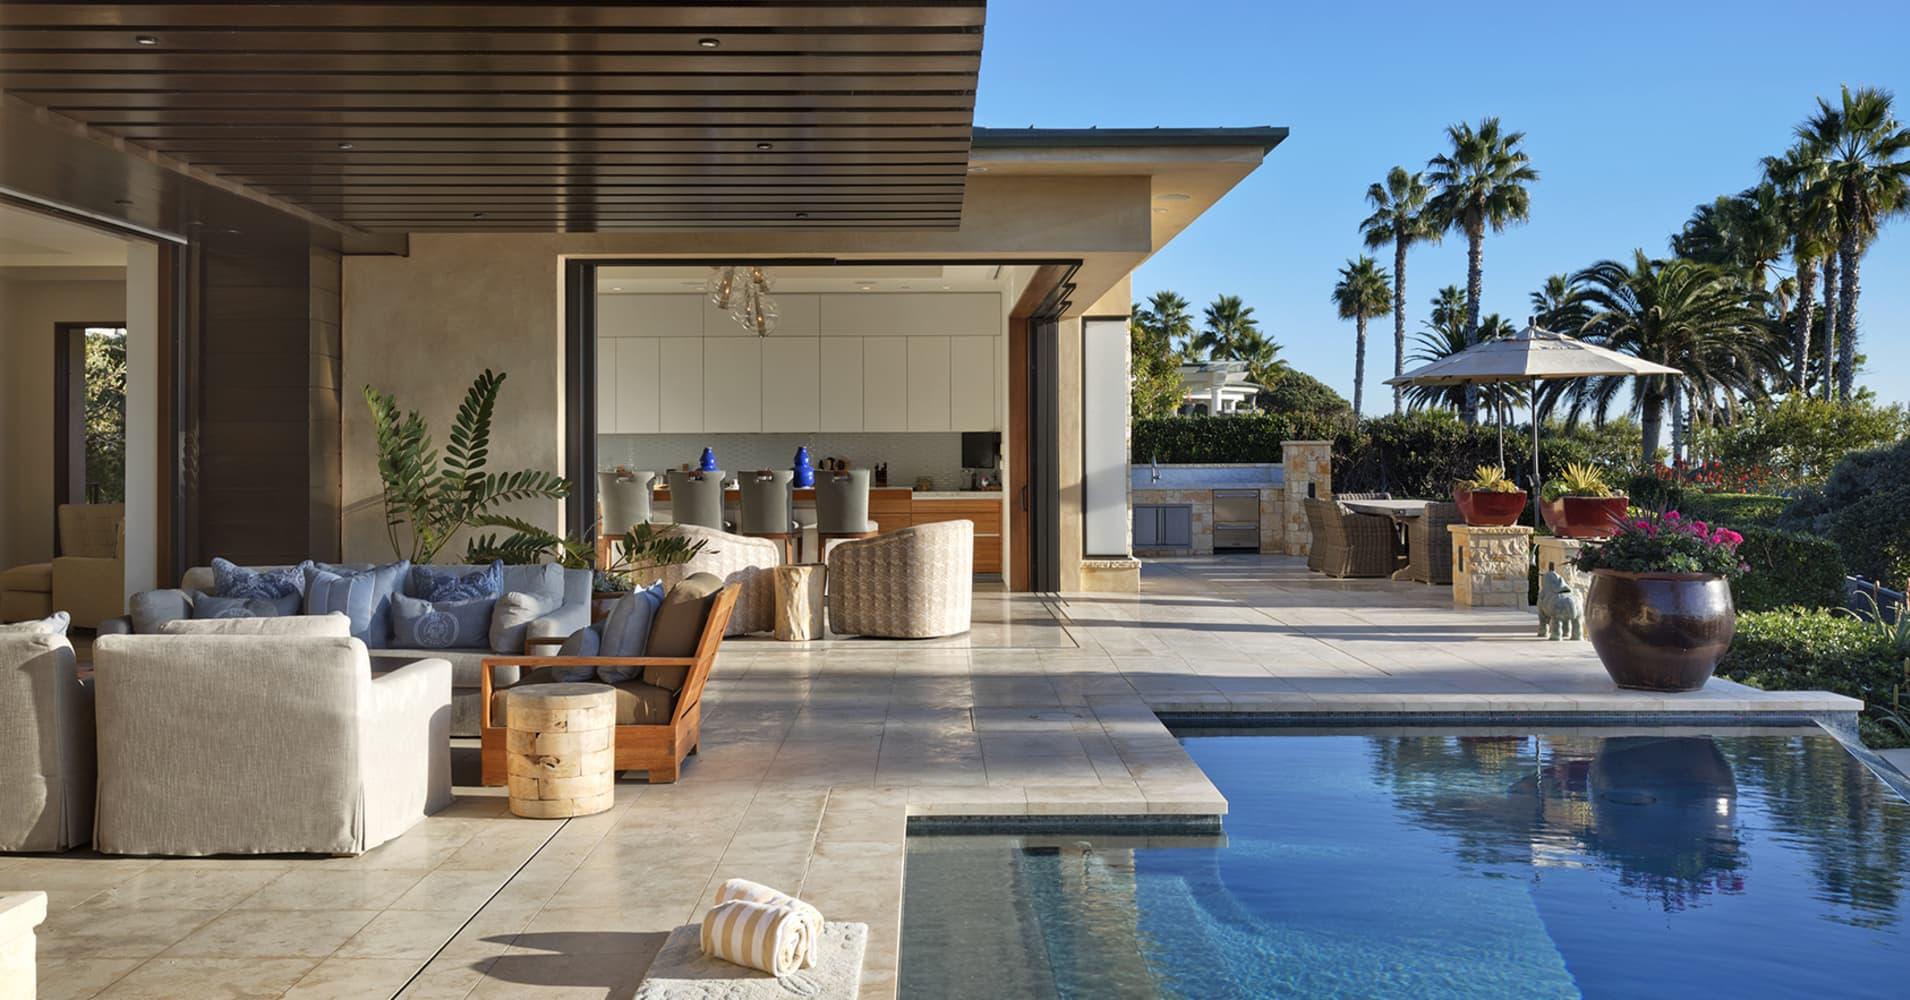 Mark Cuban just bought a $19 million Laguna Beach vacation mansion — take a look inside